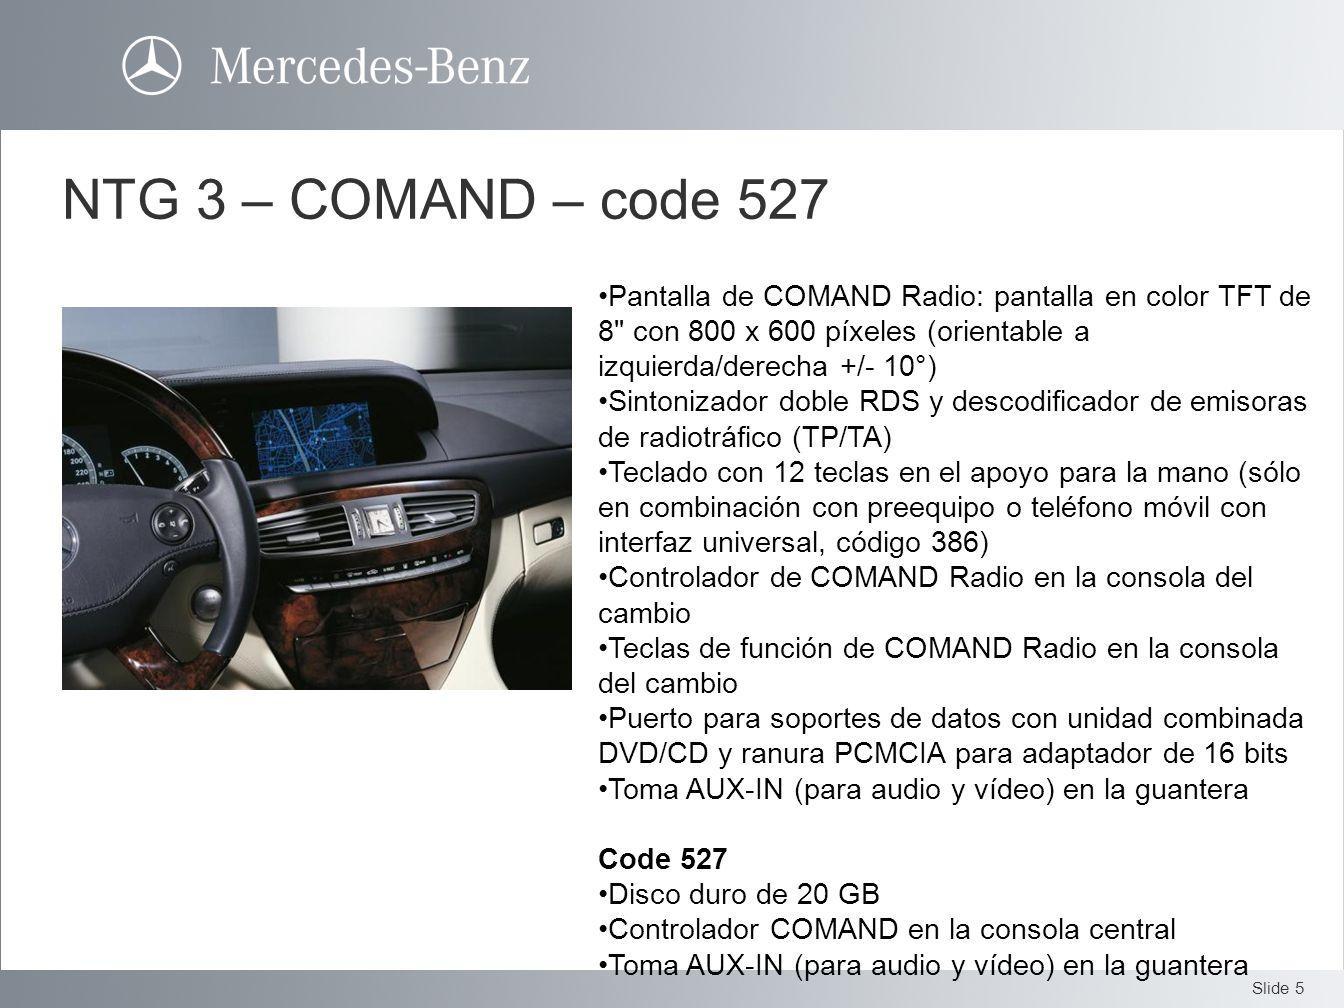 NTG 3 – COMAND – code 527 Pantalla de COMAND Radio: pantalla en color TFT de 8 con 800 x 600 píxeles (orientable a izquierda/derecha +/- 10°)